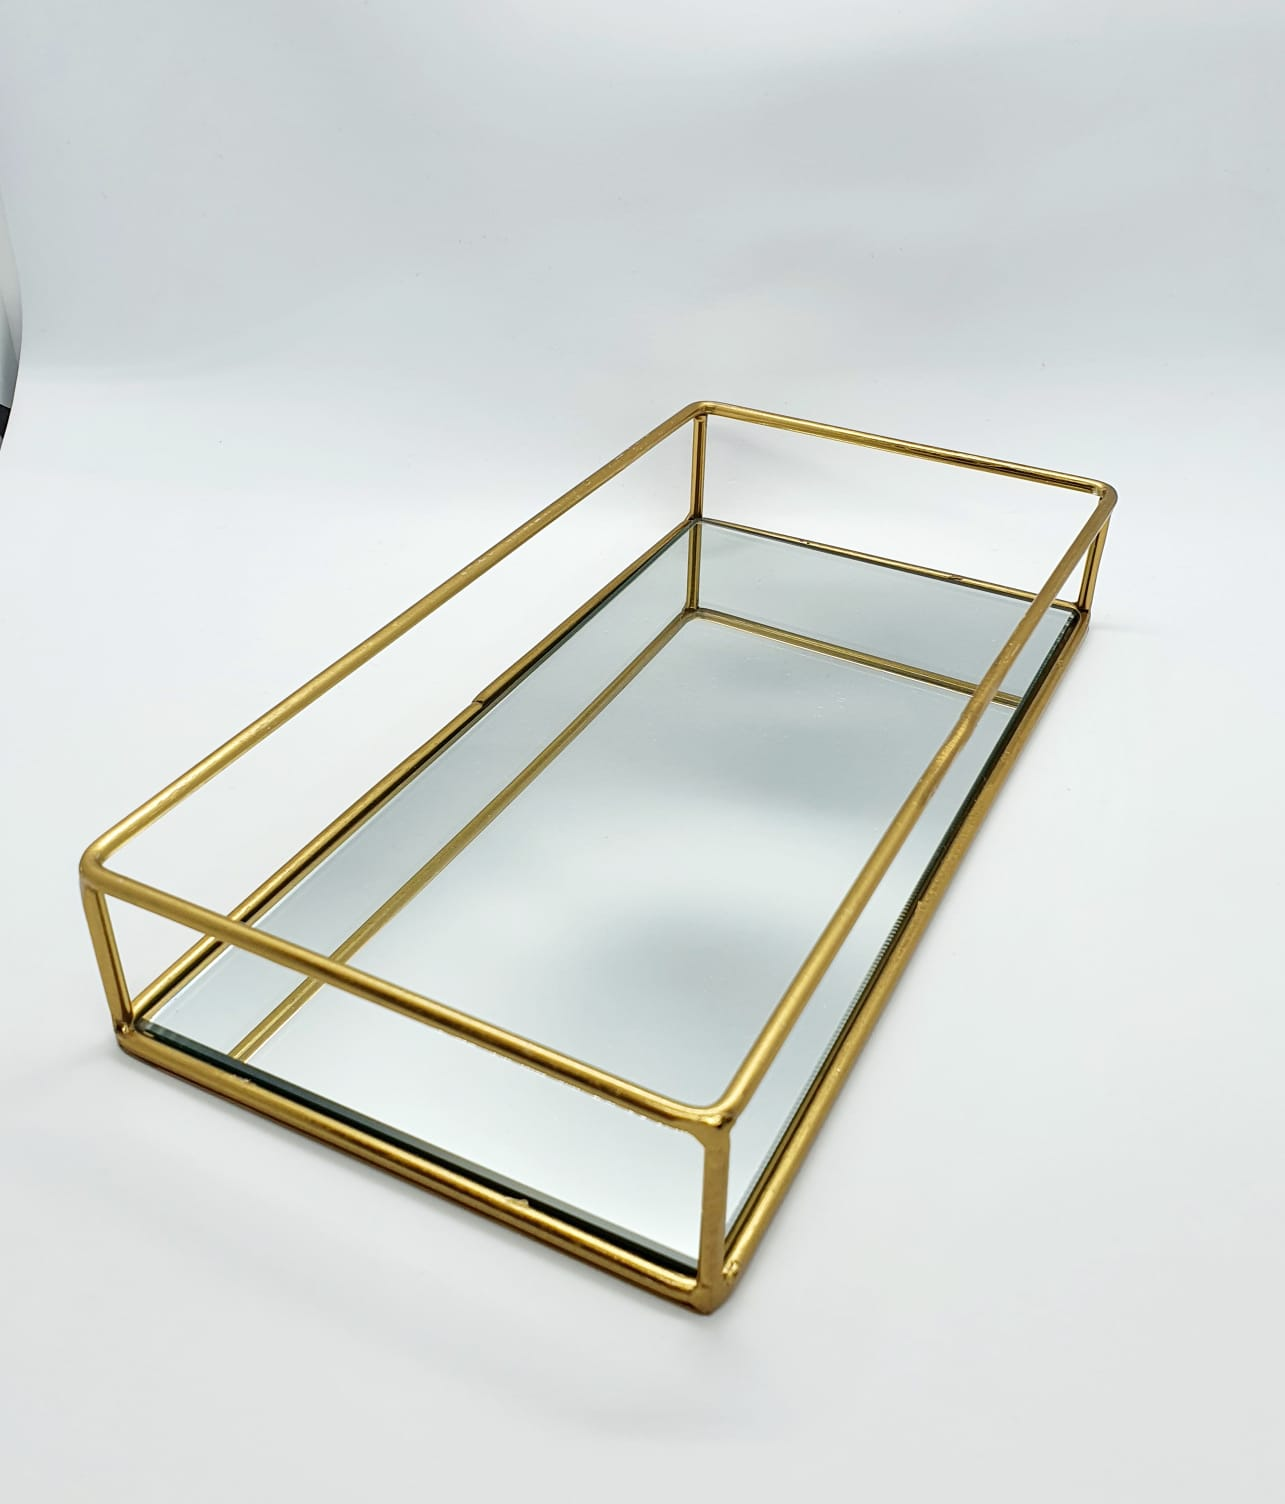 Bandeja Imperial espelhada dourada (menor)